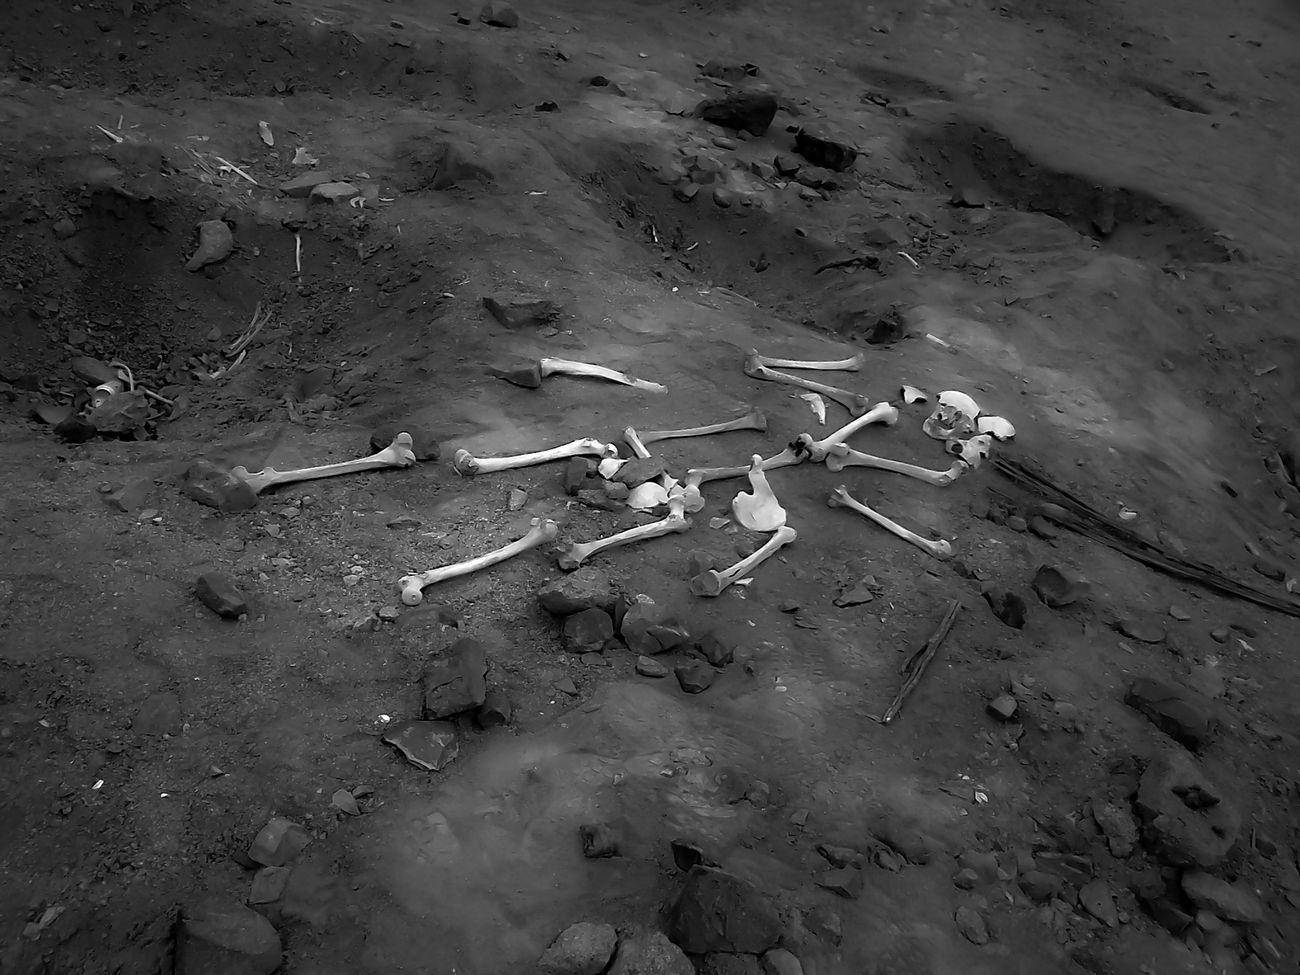 Bonzzle Archeology Bones Cemetery Corpse Ichsma Pampa De Las Flores Sepulcher Skeleton Tomb First Eyeem Photo